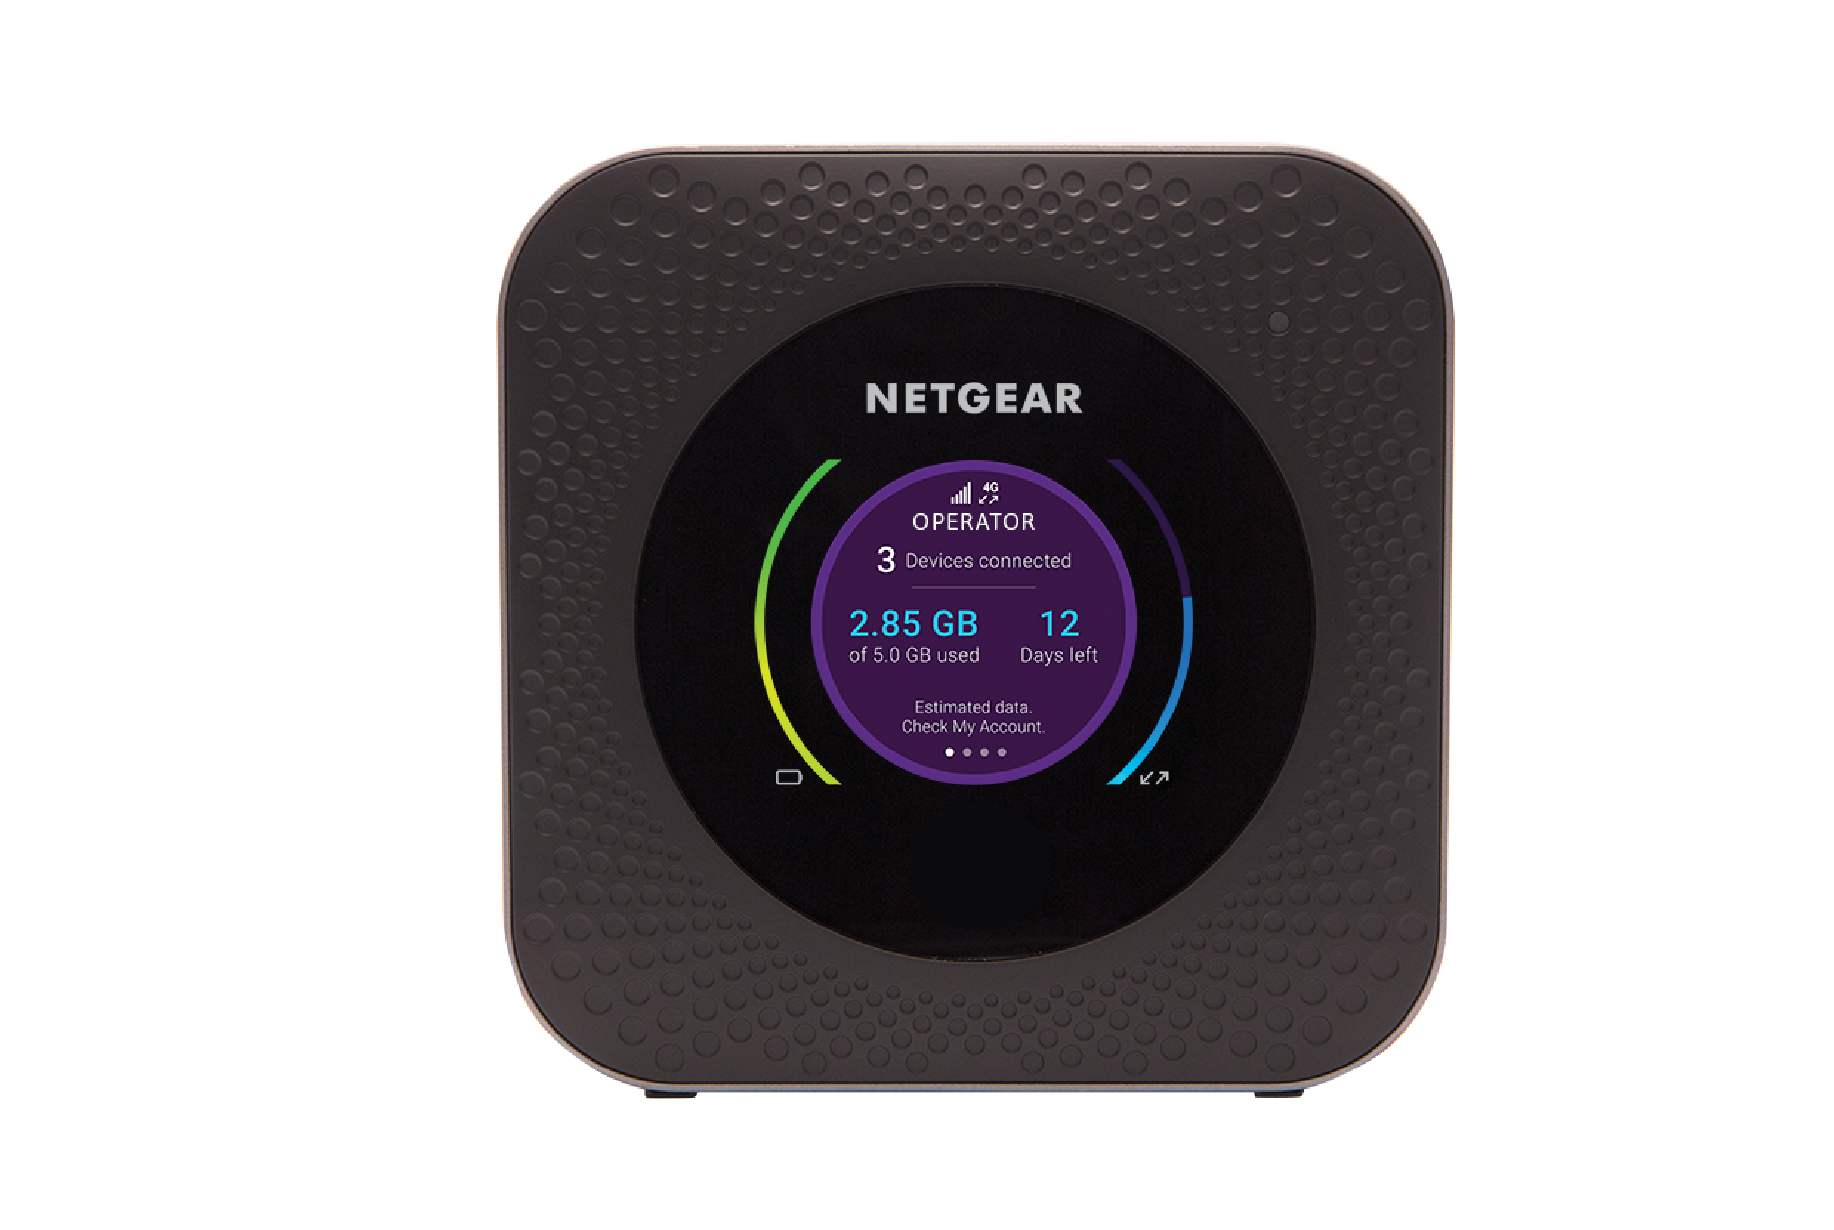 mr1100 mobile routers mobile service providers netgear. Black Bedroom Furniture Sets. Home Design Ideas